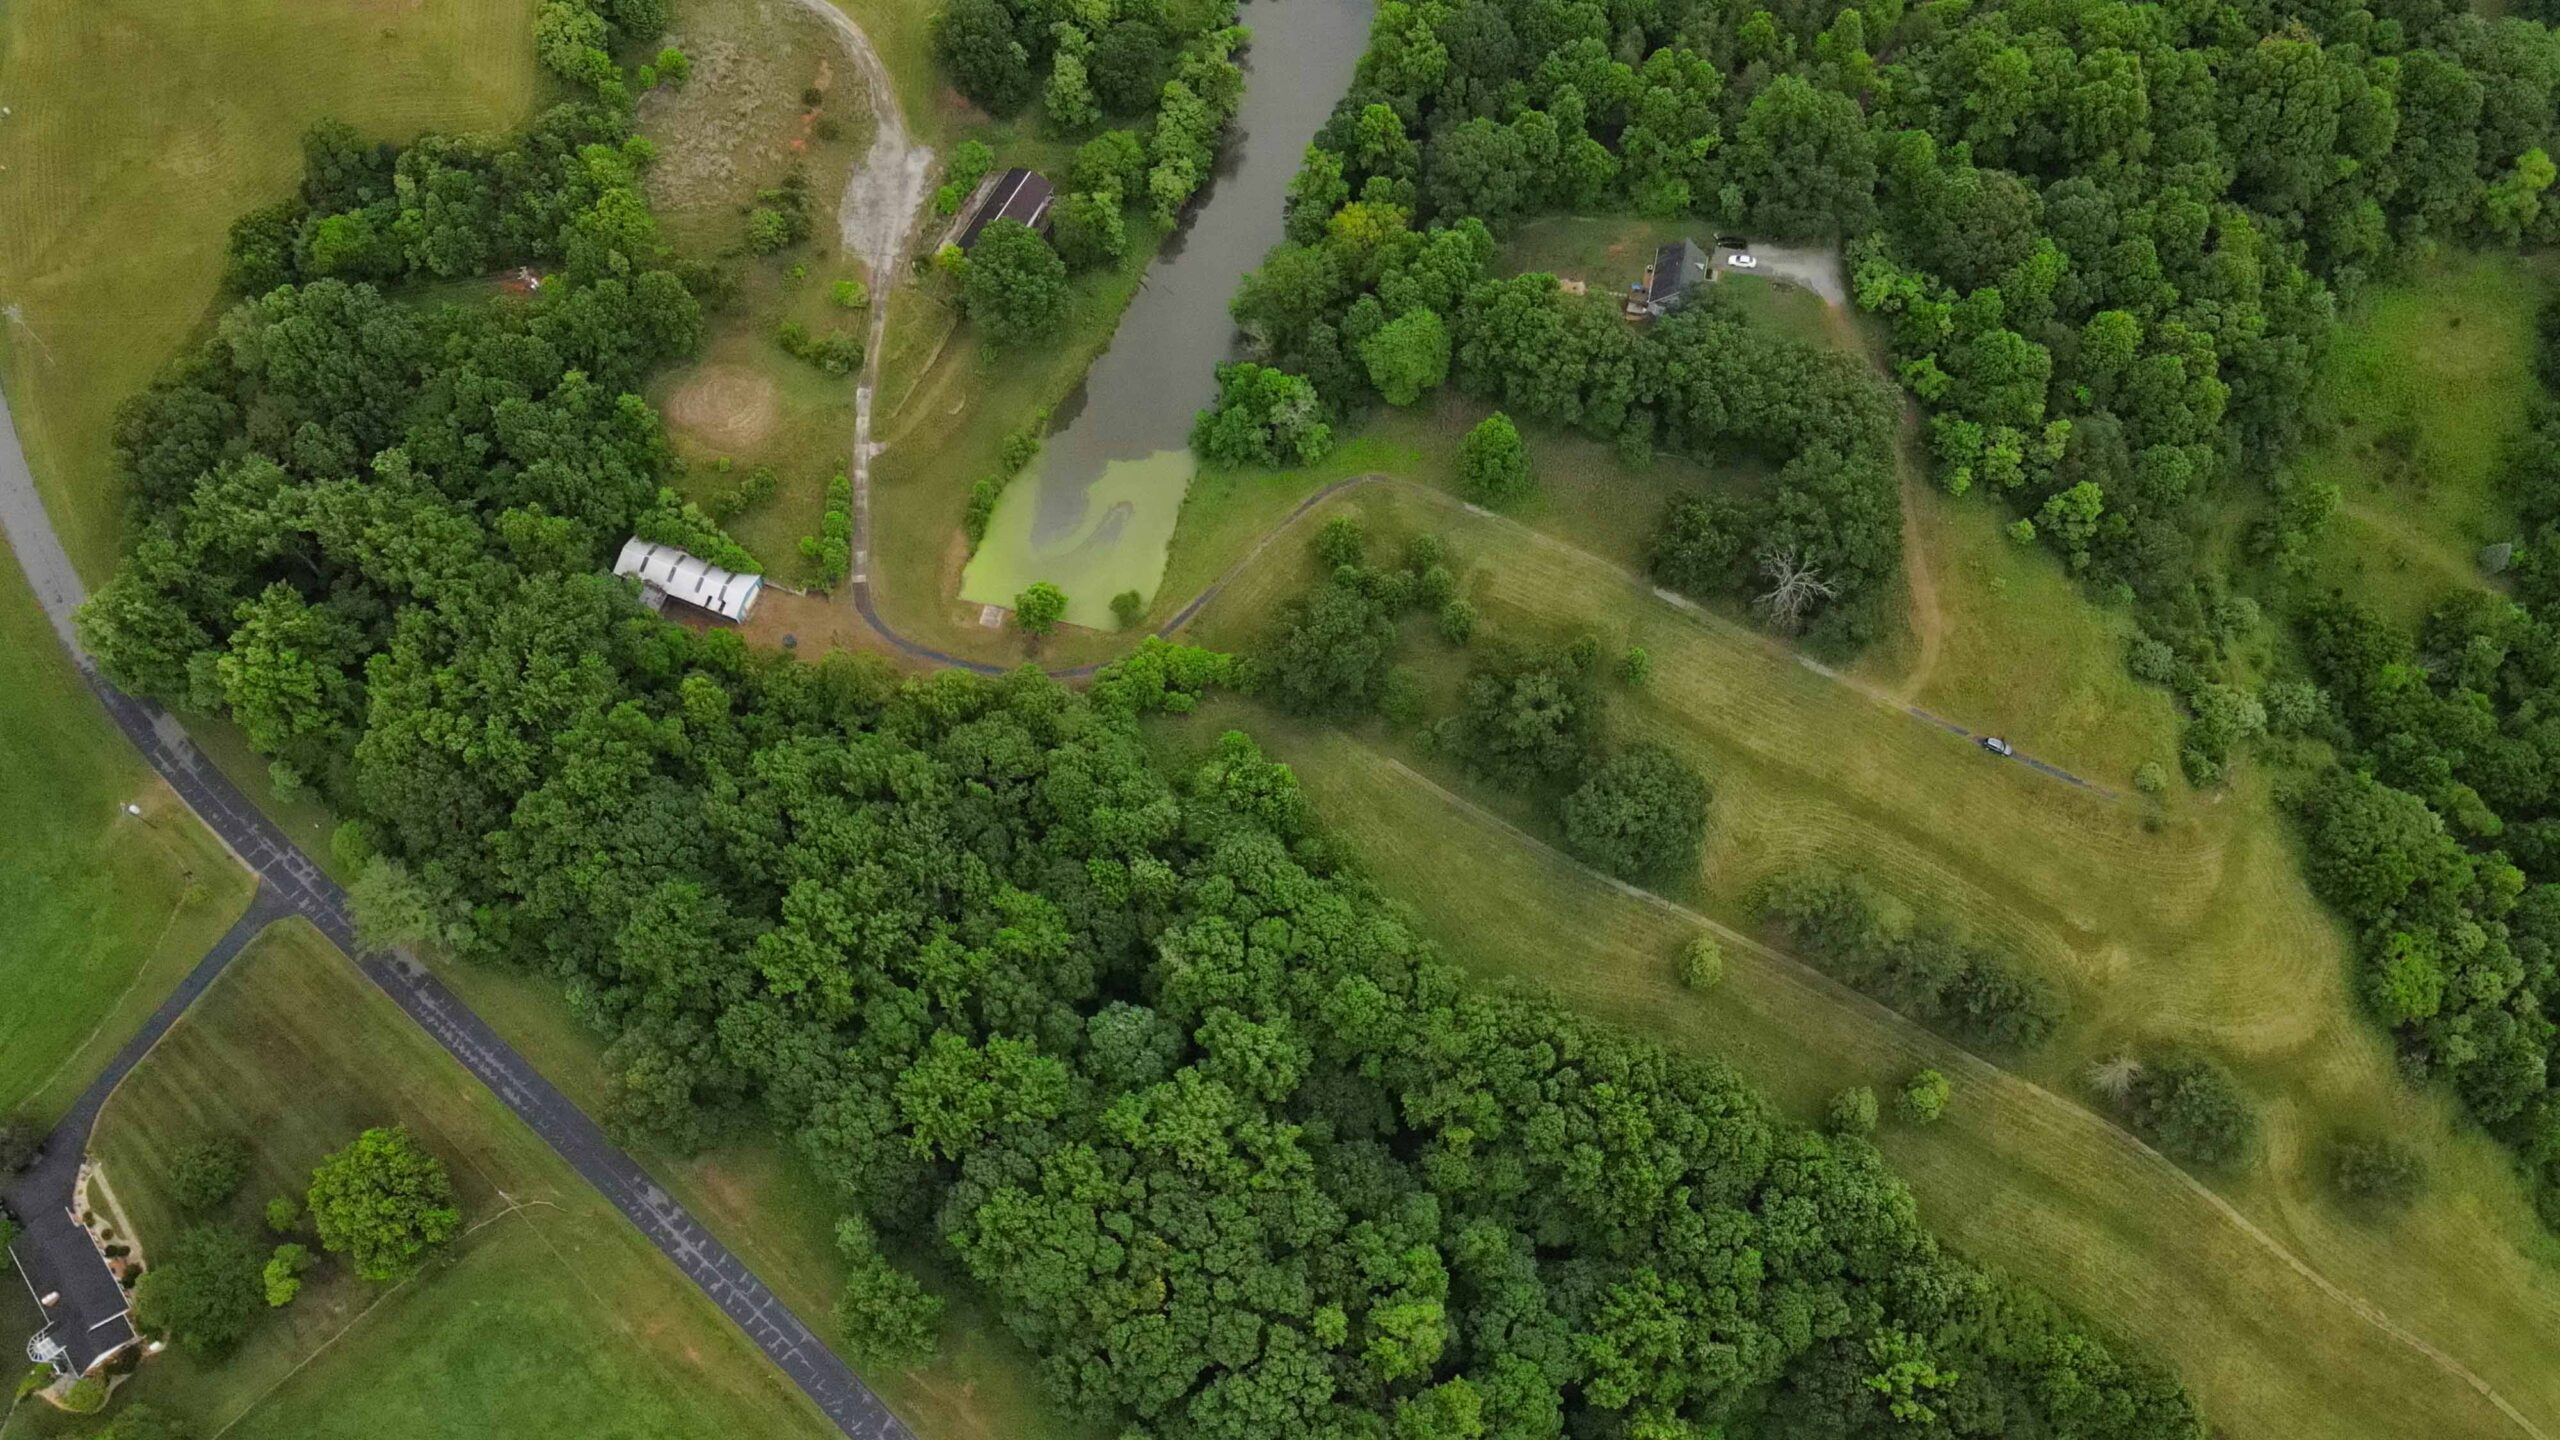 Home Site Near Smith Mountain Lake, Sycamore Ridge, Lot 11-5